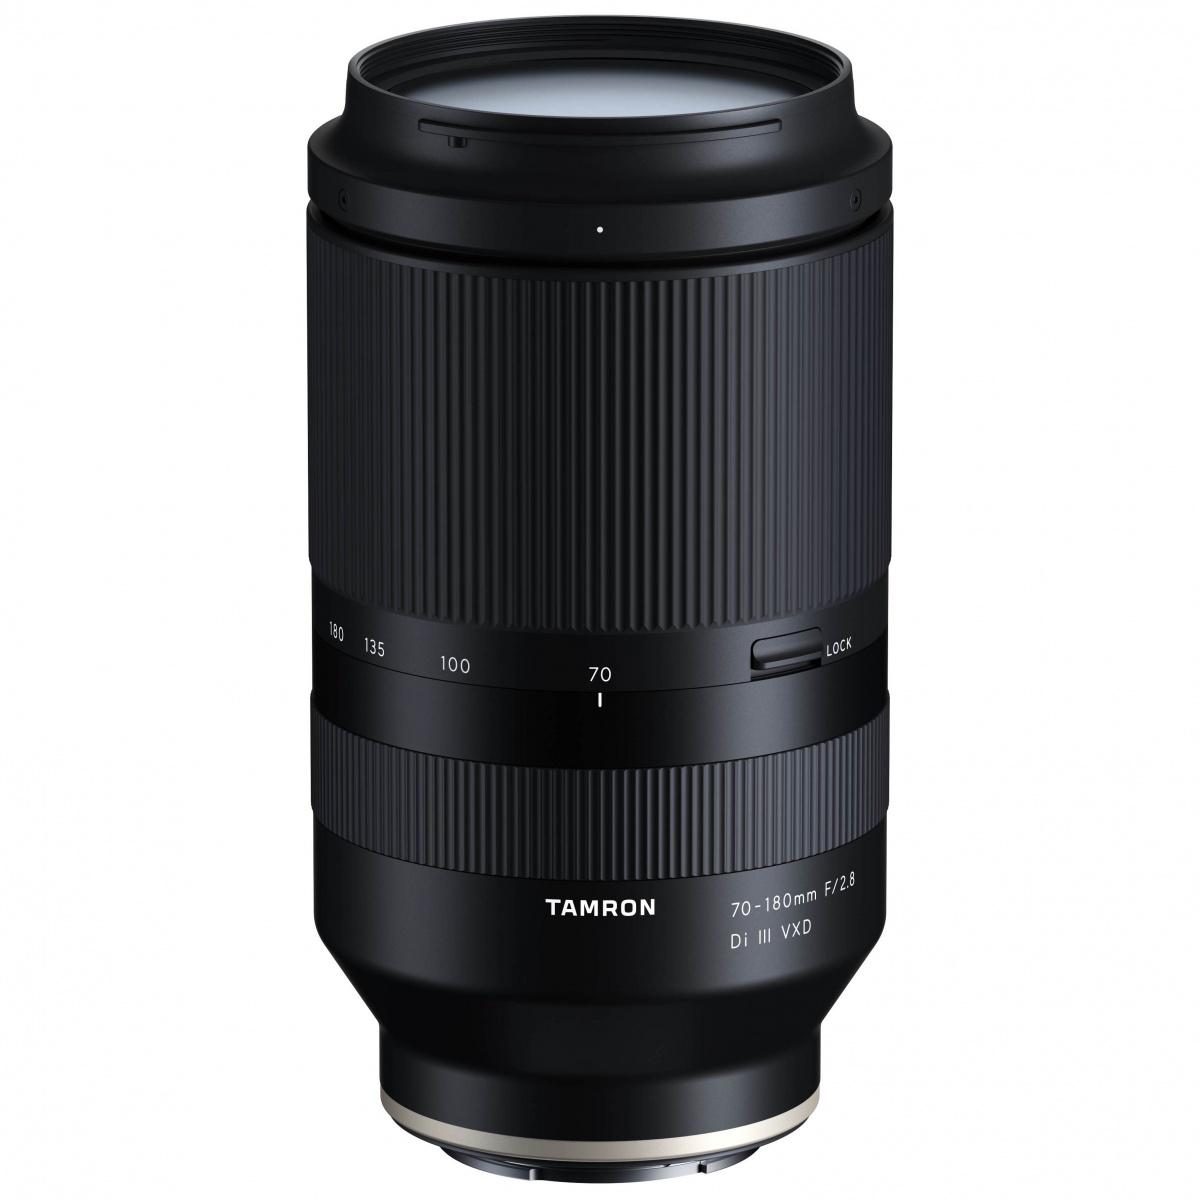 Tamron 70-180 mm 1:2,8 DI III VXD Sony FE